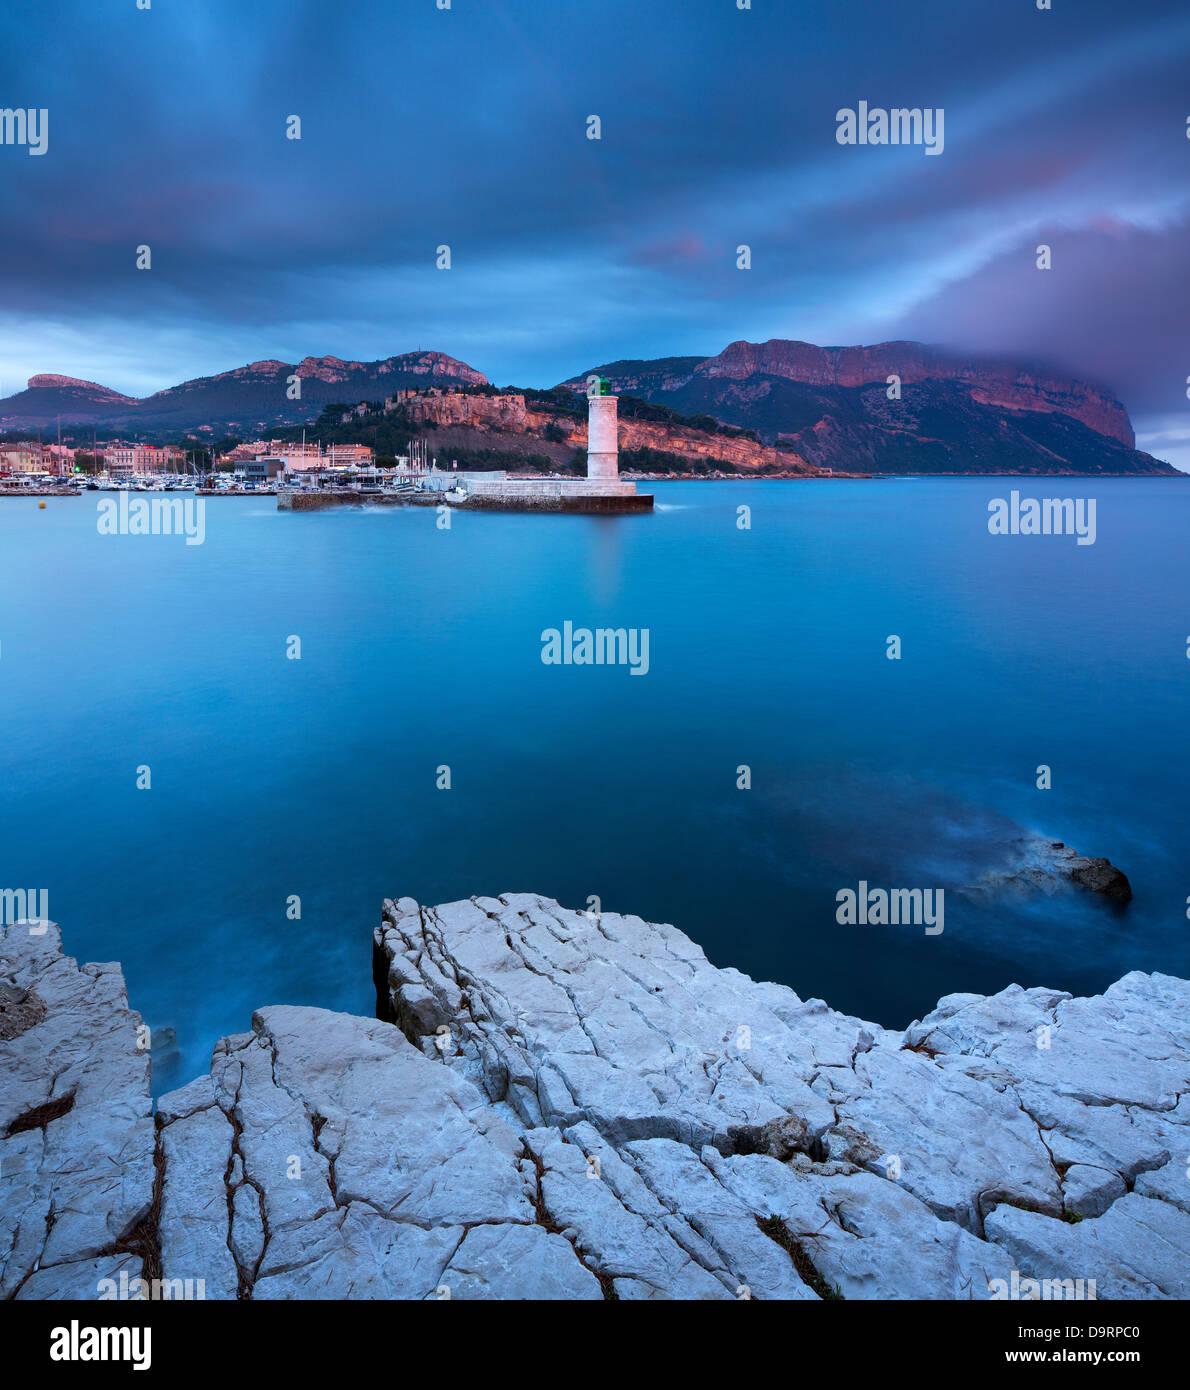 Cassis al crepuscolo, Bouches-du-Rhône , Côte d'Azur, Provenza, Francia Immagini Stock